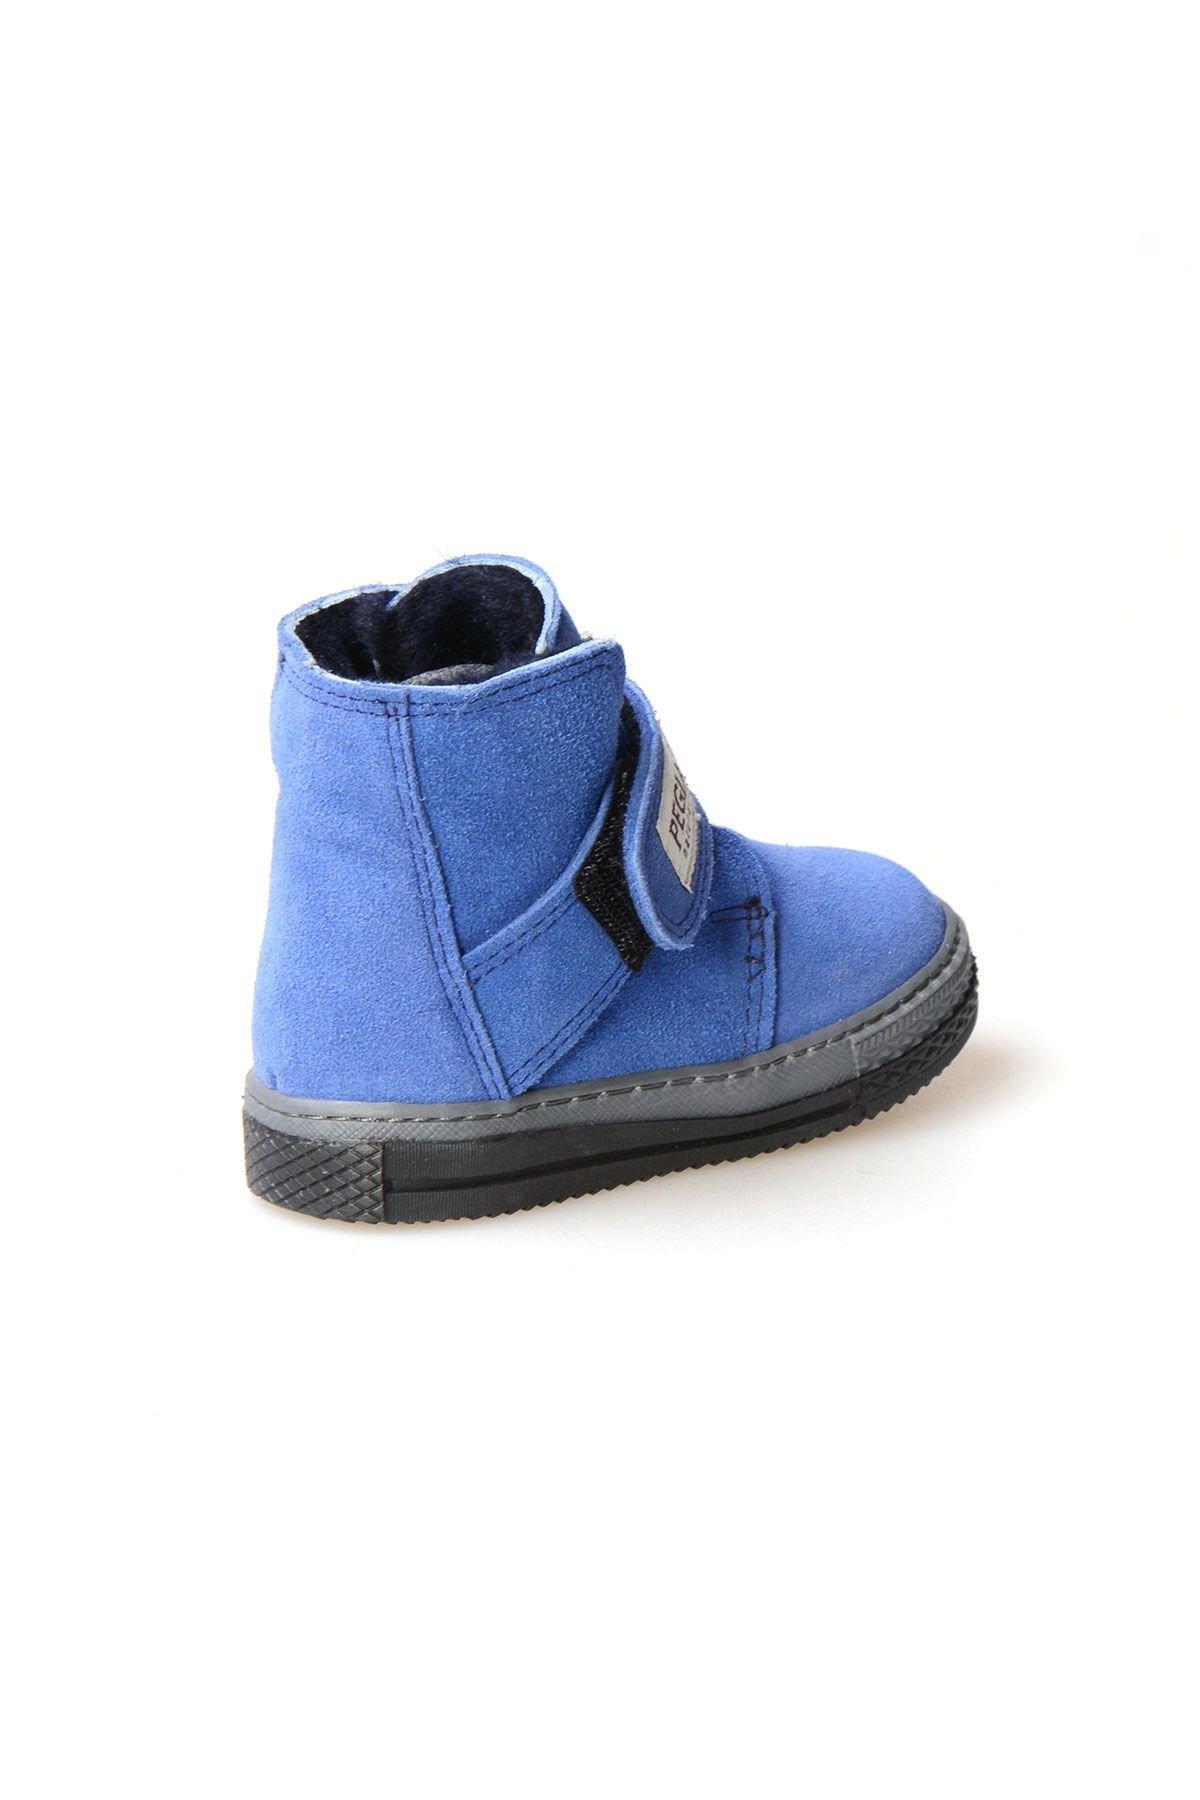 Pegia Genuine Suede Sheepskin Lined Kid's Boots 186010 Koyu Mavi